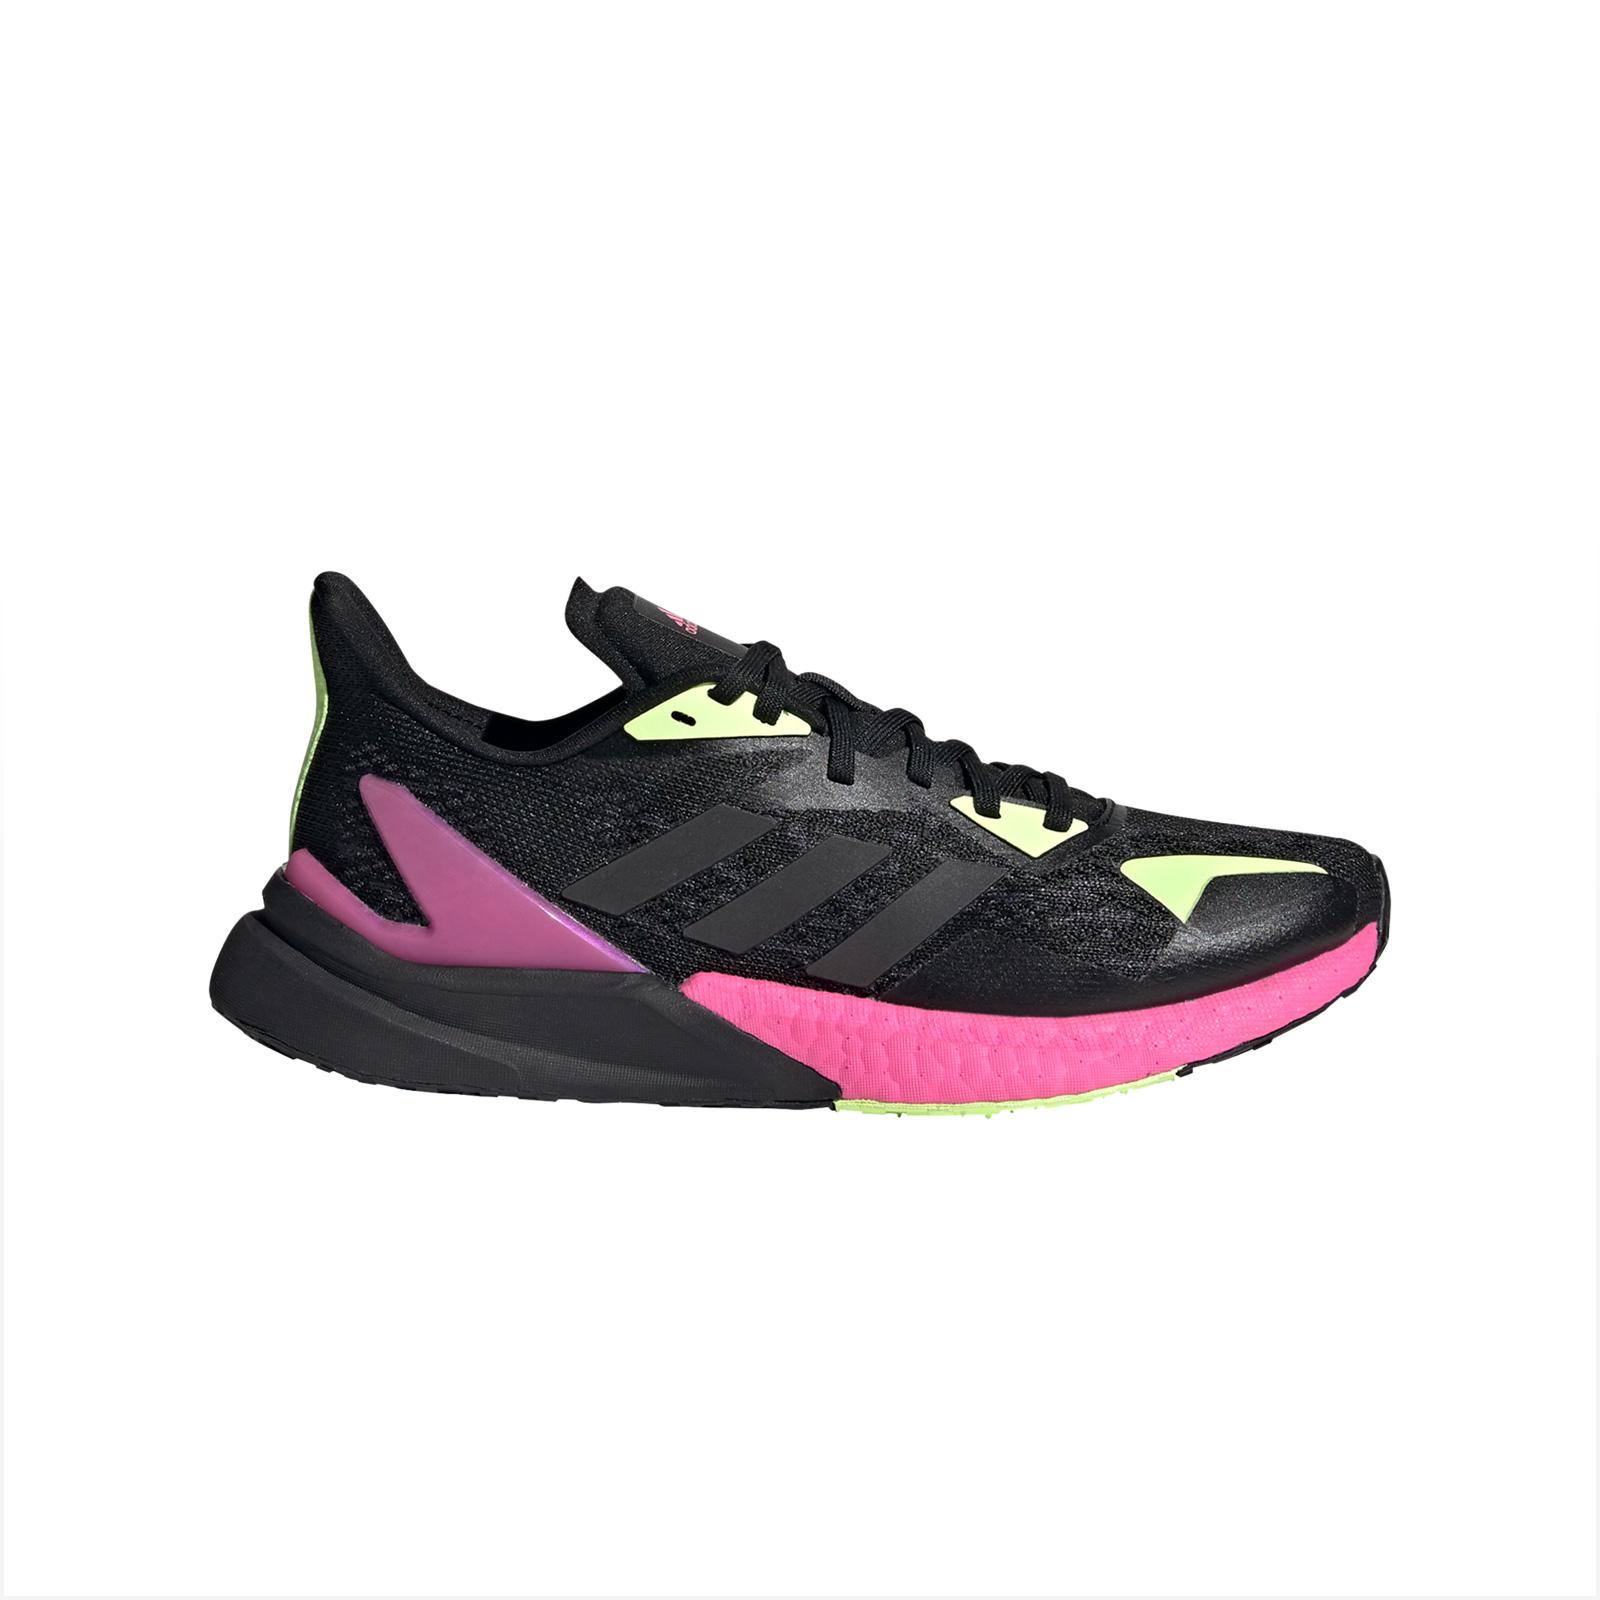 adidas - X9000L3 W - CBLACK/CARBON/SCRPNK